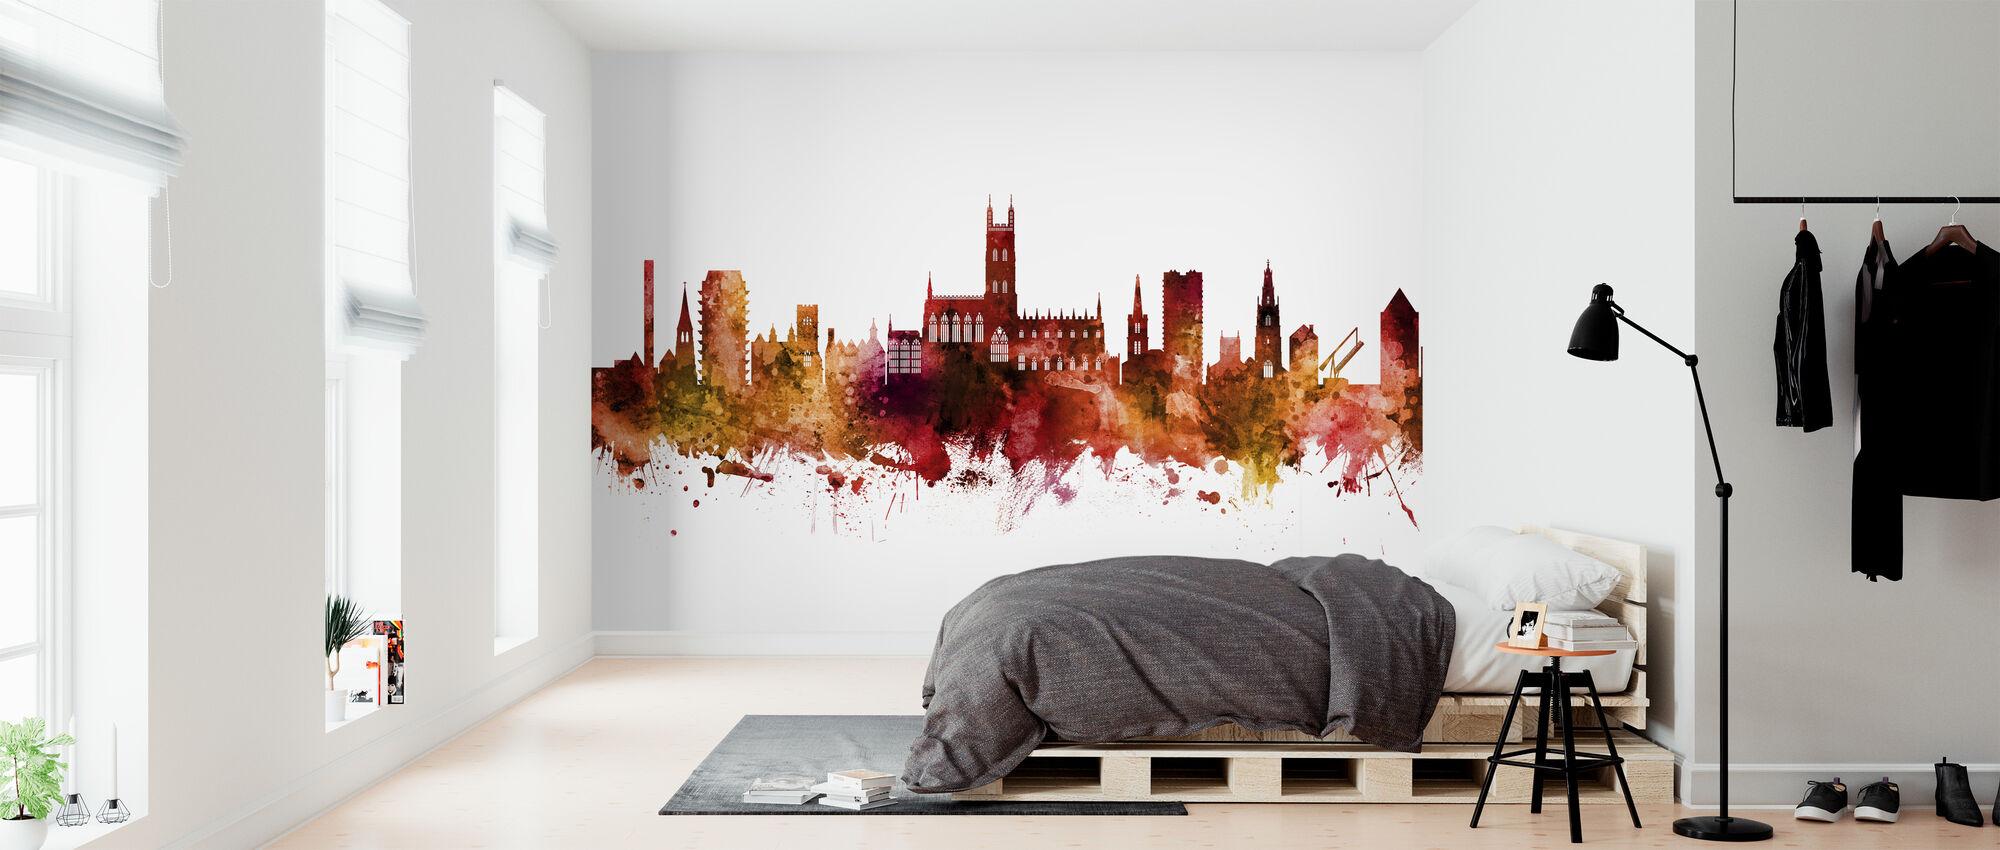 Gloucester England Skyline - Wallpaper - Bedroom